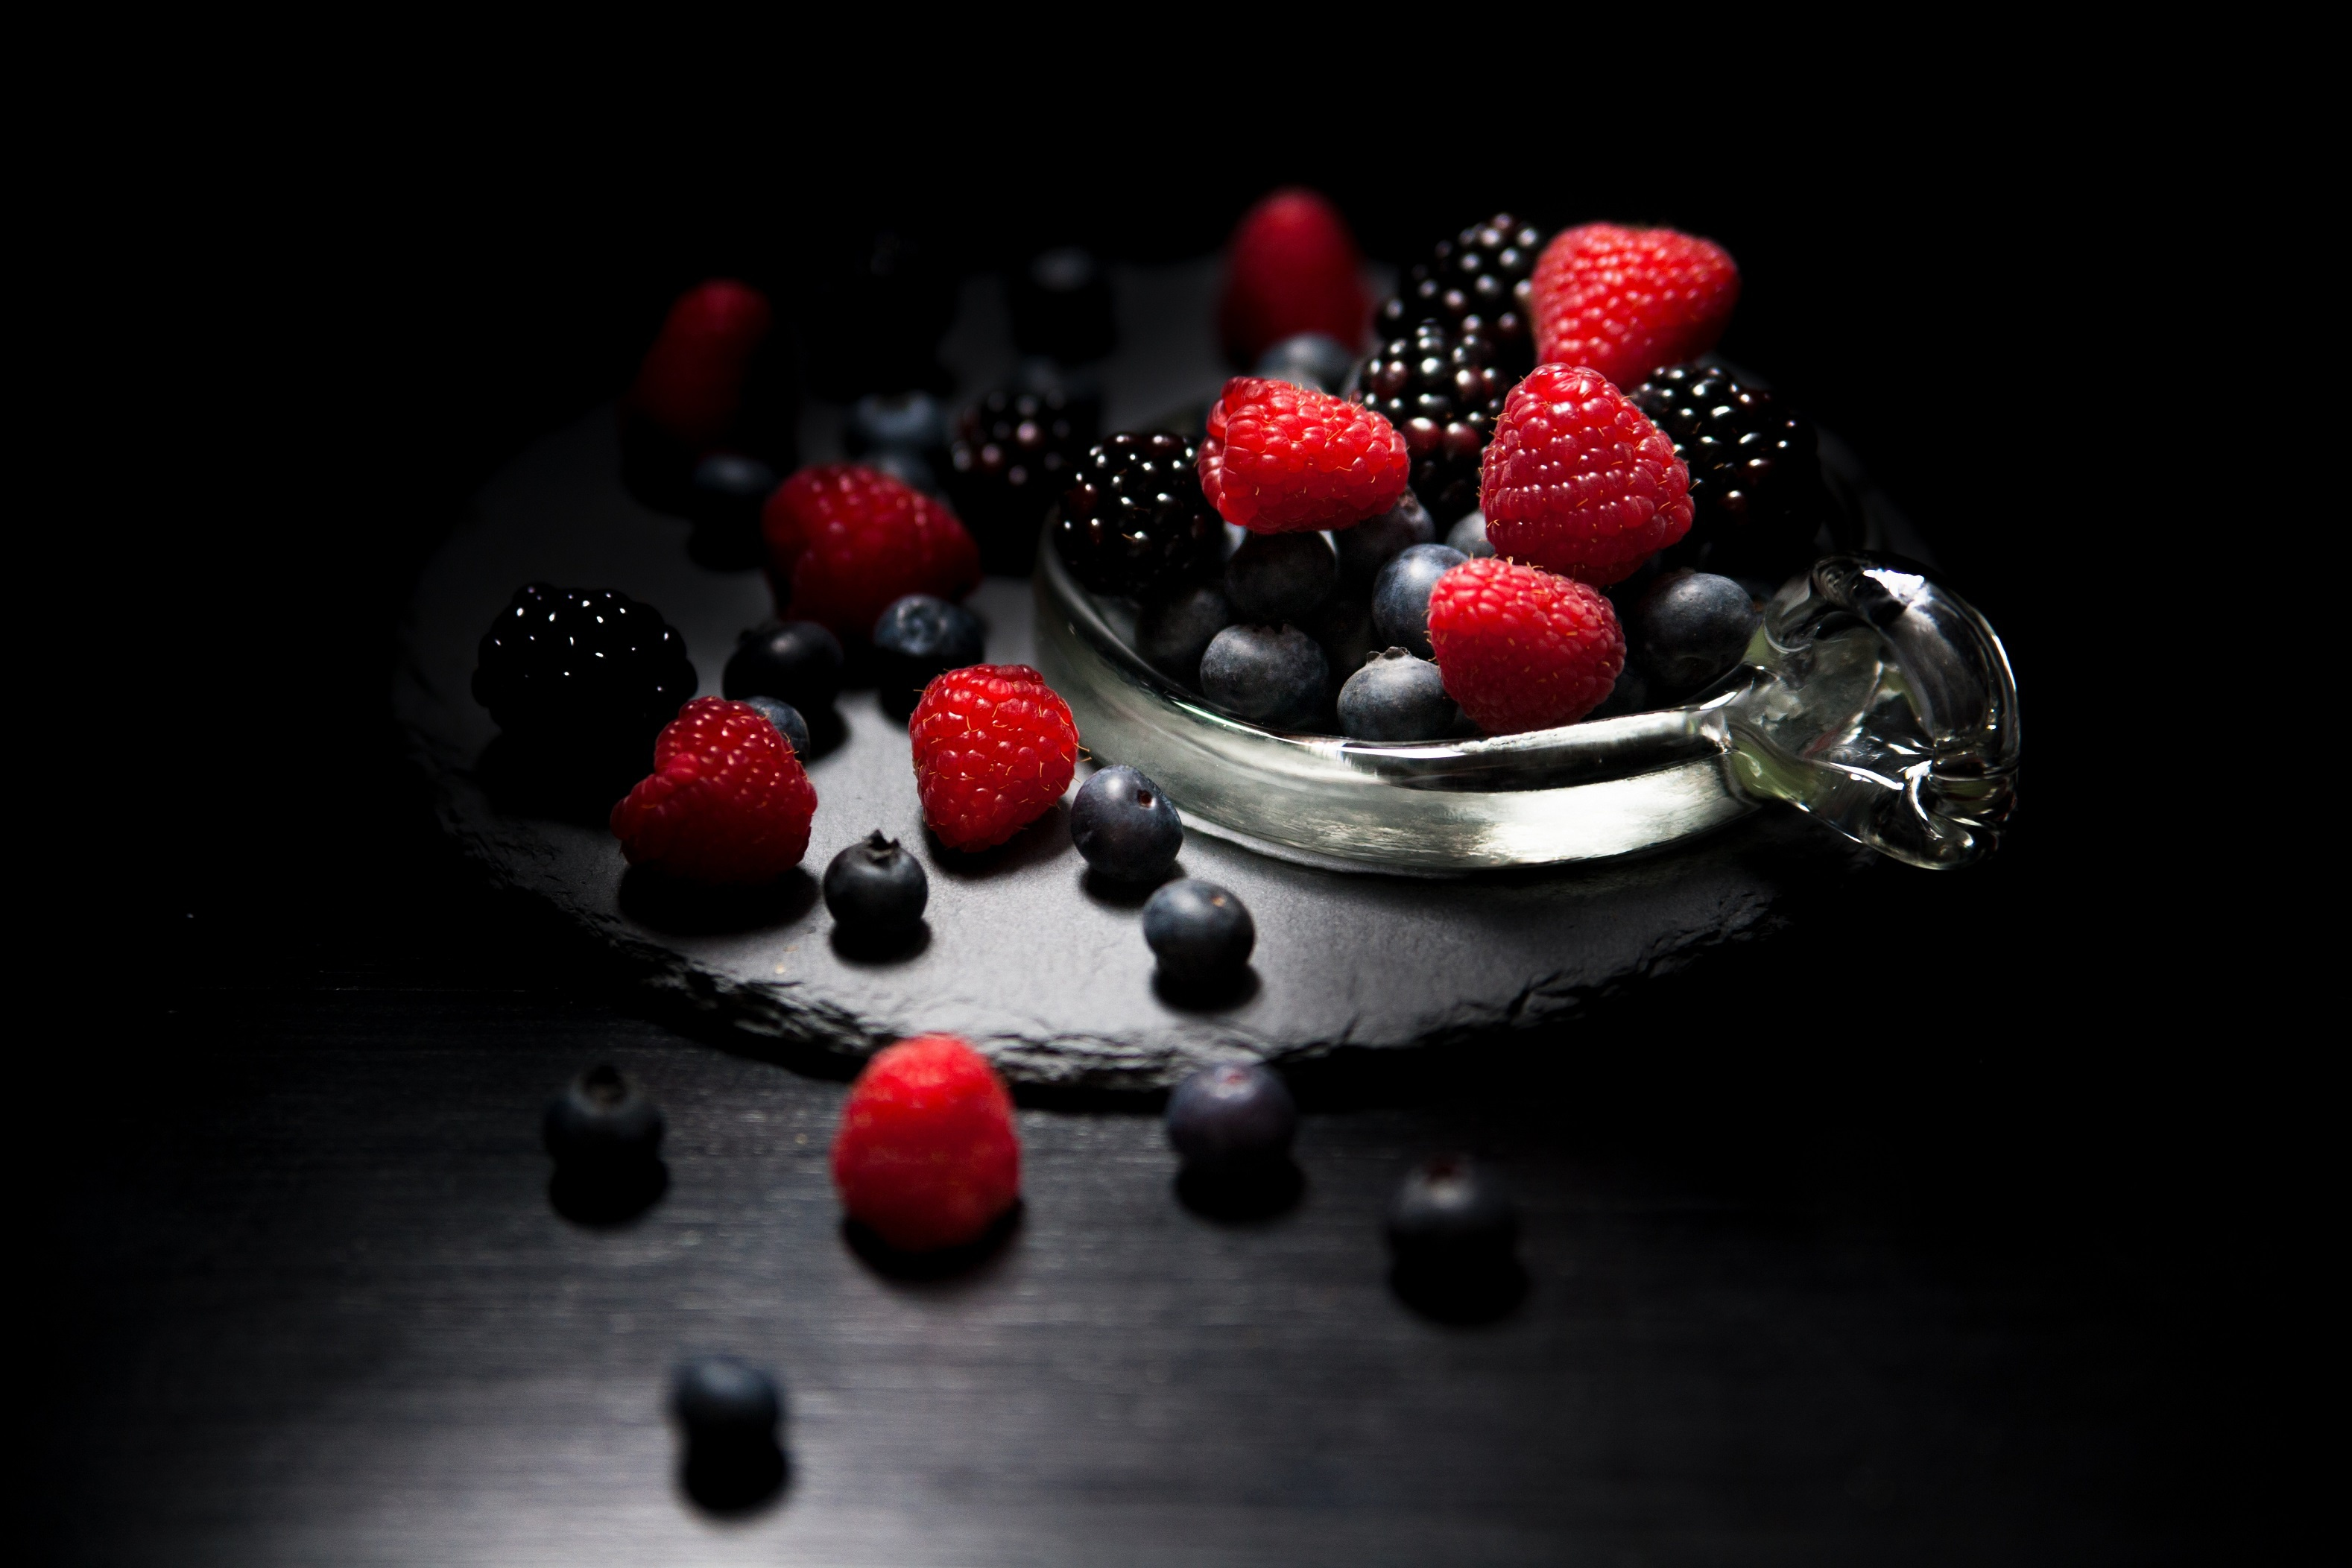 Berry Blackberry Blueberry Fruit Raspberry Still Life 3156x2104